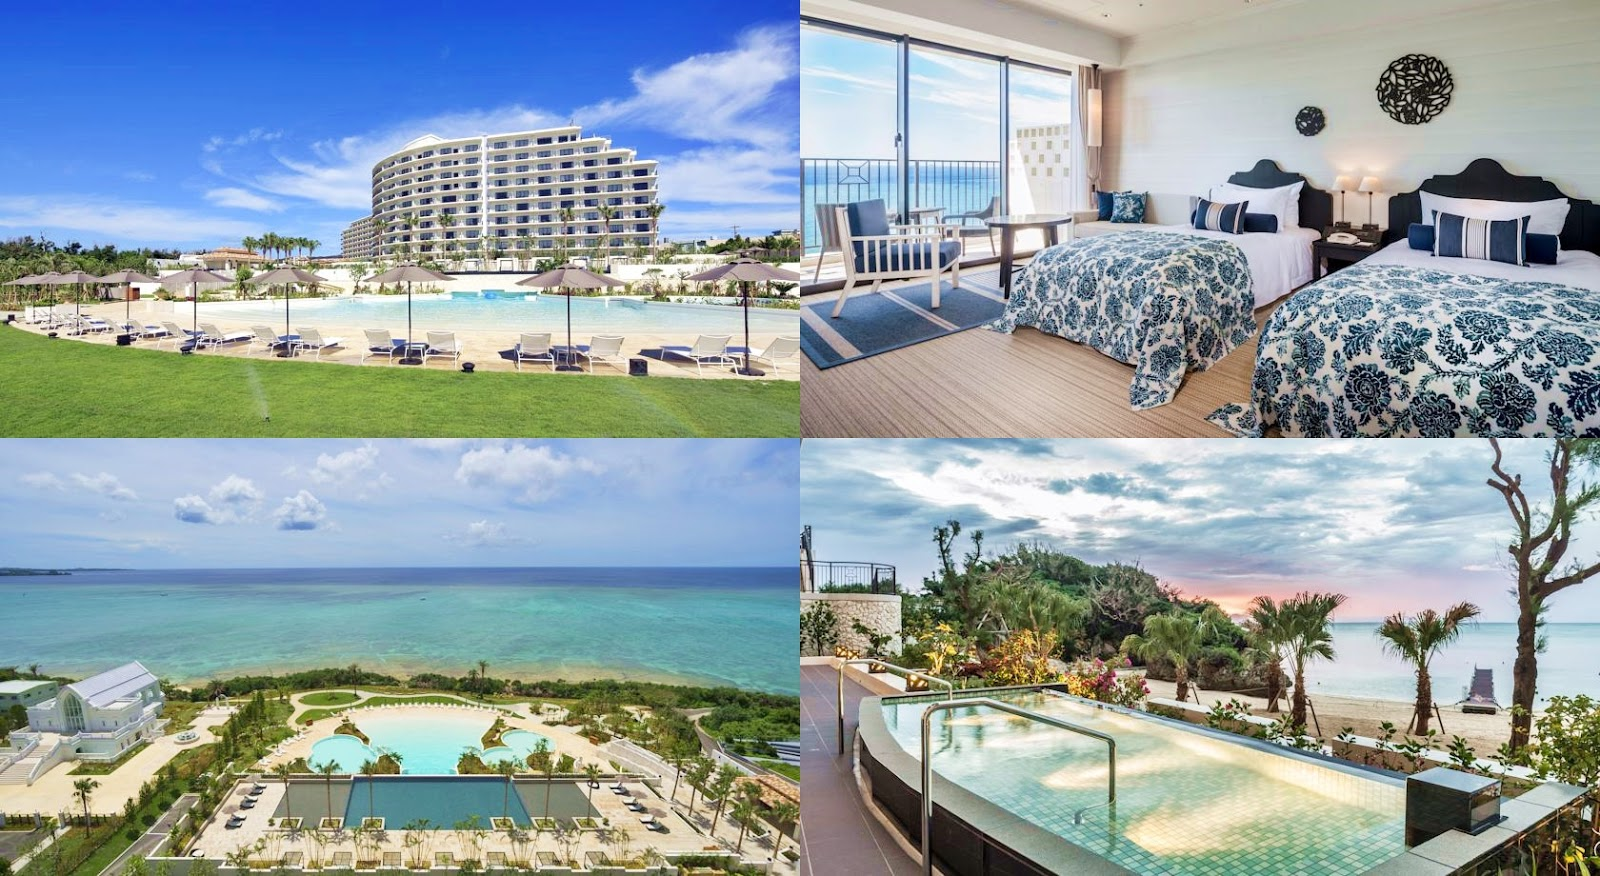 沖繩-住宿-推薦-飯店-旅館-民宿-公寓-沖繩蒙特利水療度假酒店-Hotel-Monterey-Okinawa-Spa&Resort-Okinawa-hotel-recommendation